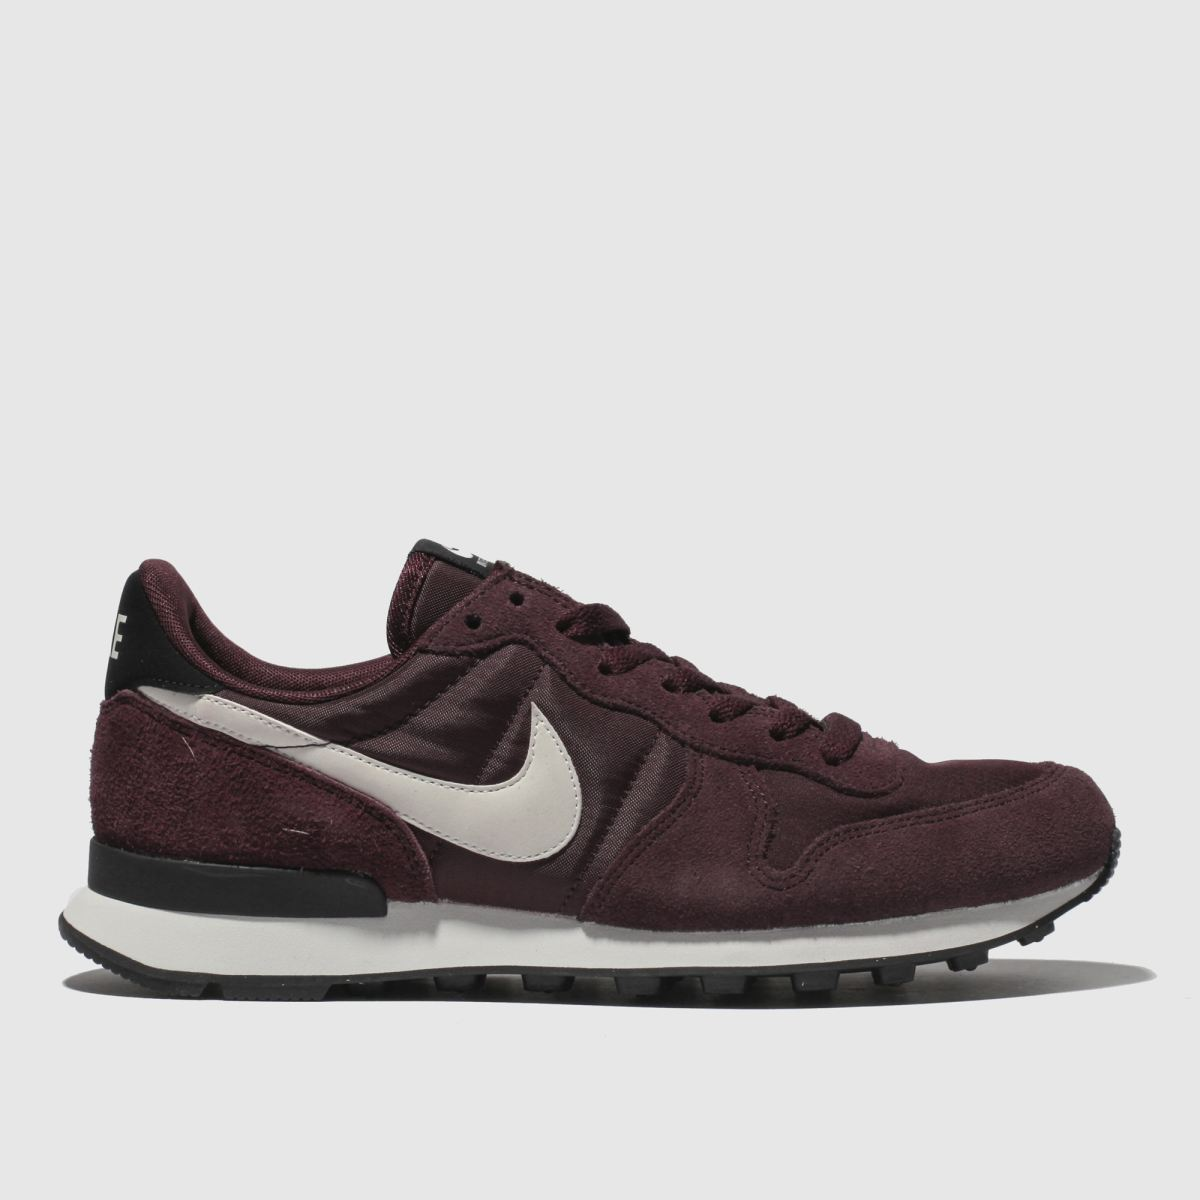 Nike Burgundy Internationalist Trainers